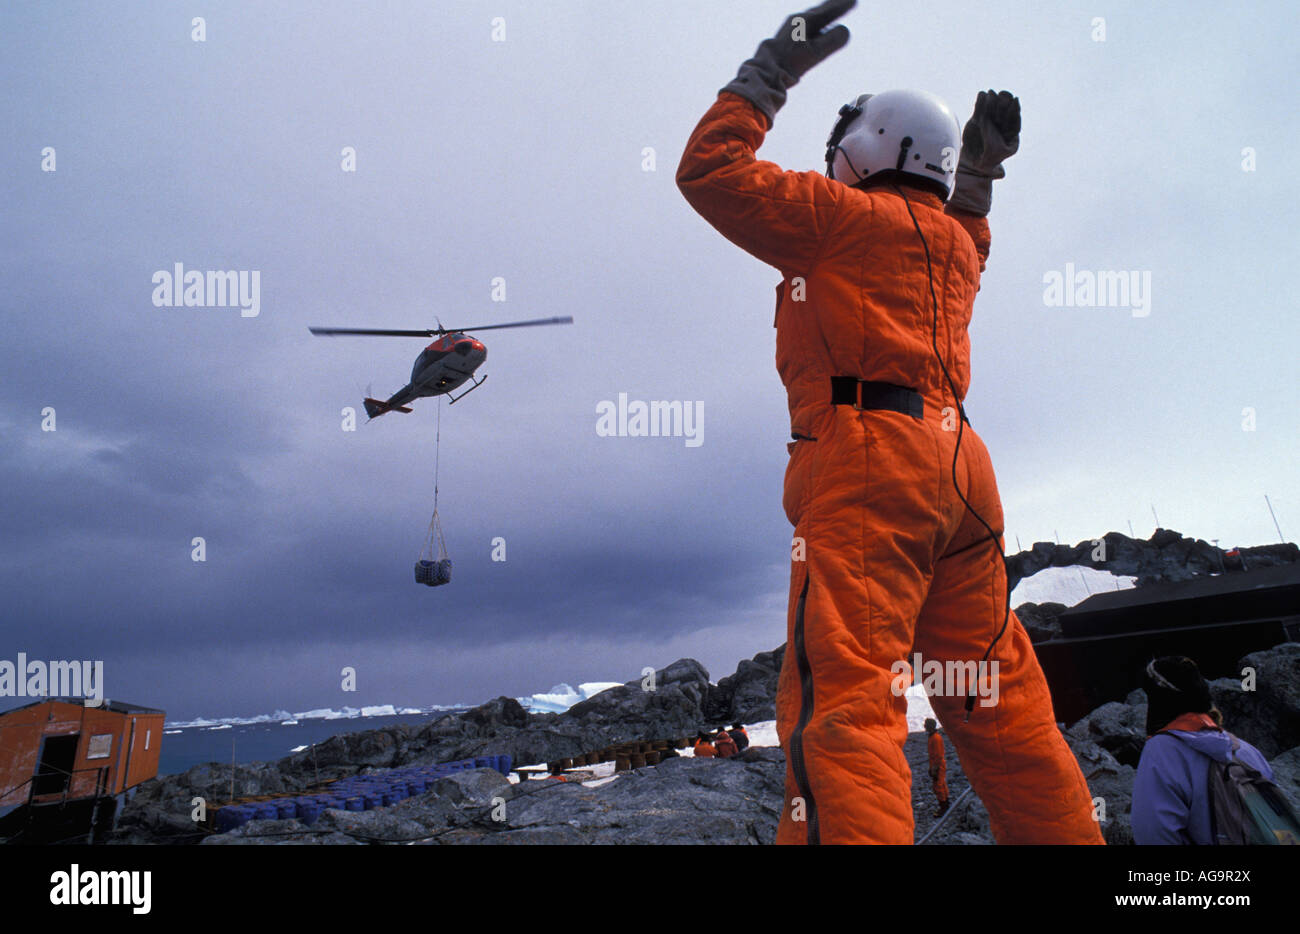 Pilot Carrying Helmet Stock Photos & Pilot Carrying Helmet